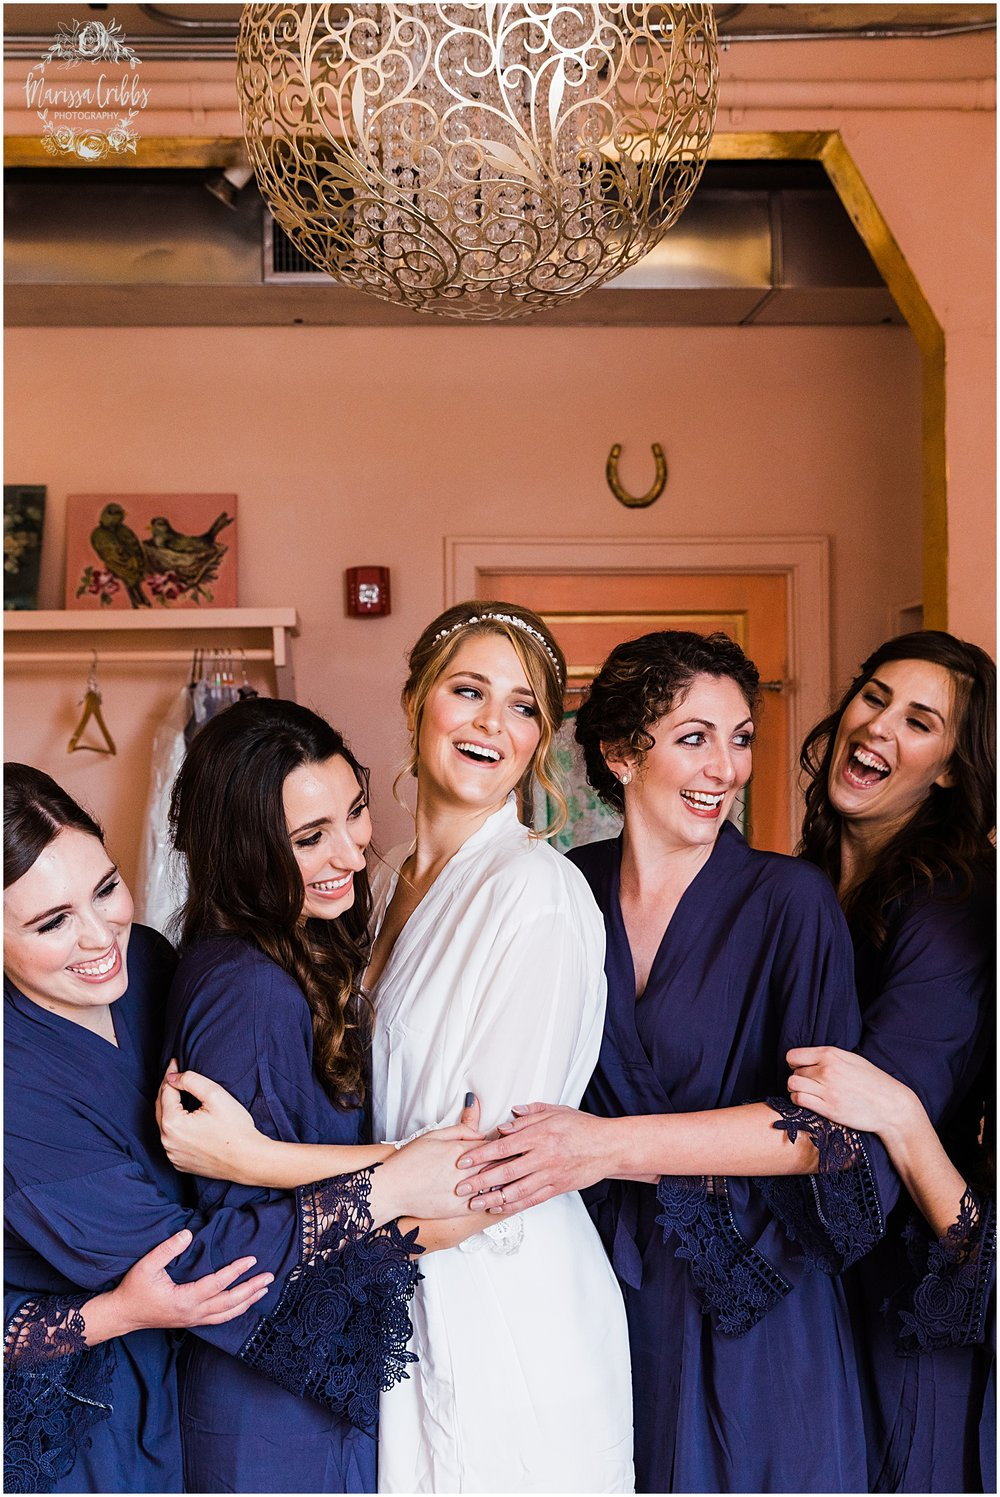 BAUER WEDDING | KELSEA & JUSTIN | MARISSA CRIBBS PHOTOGRAPHY_6489.jpg